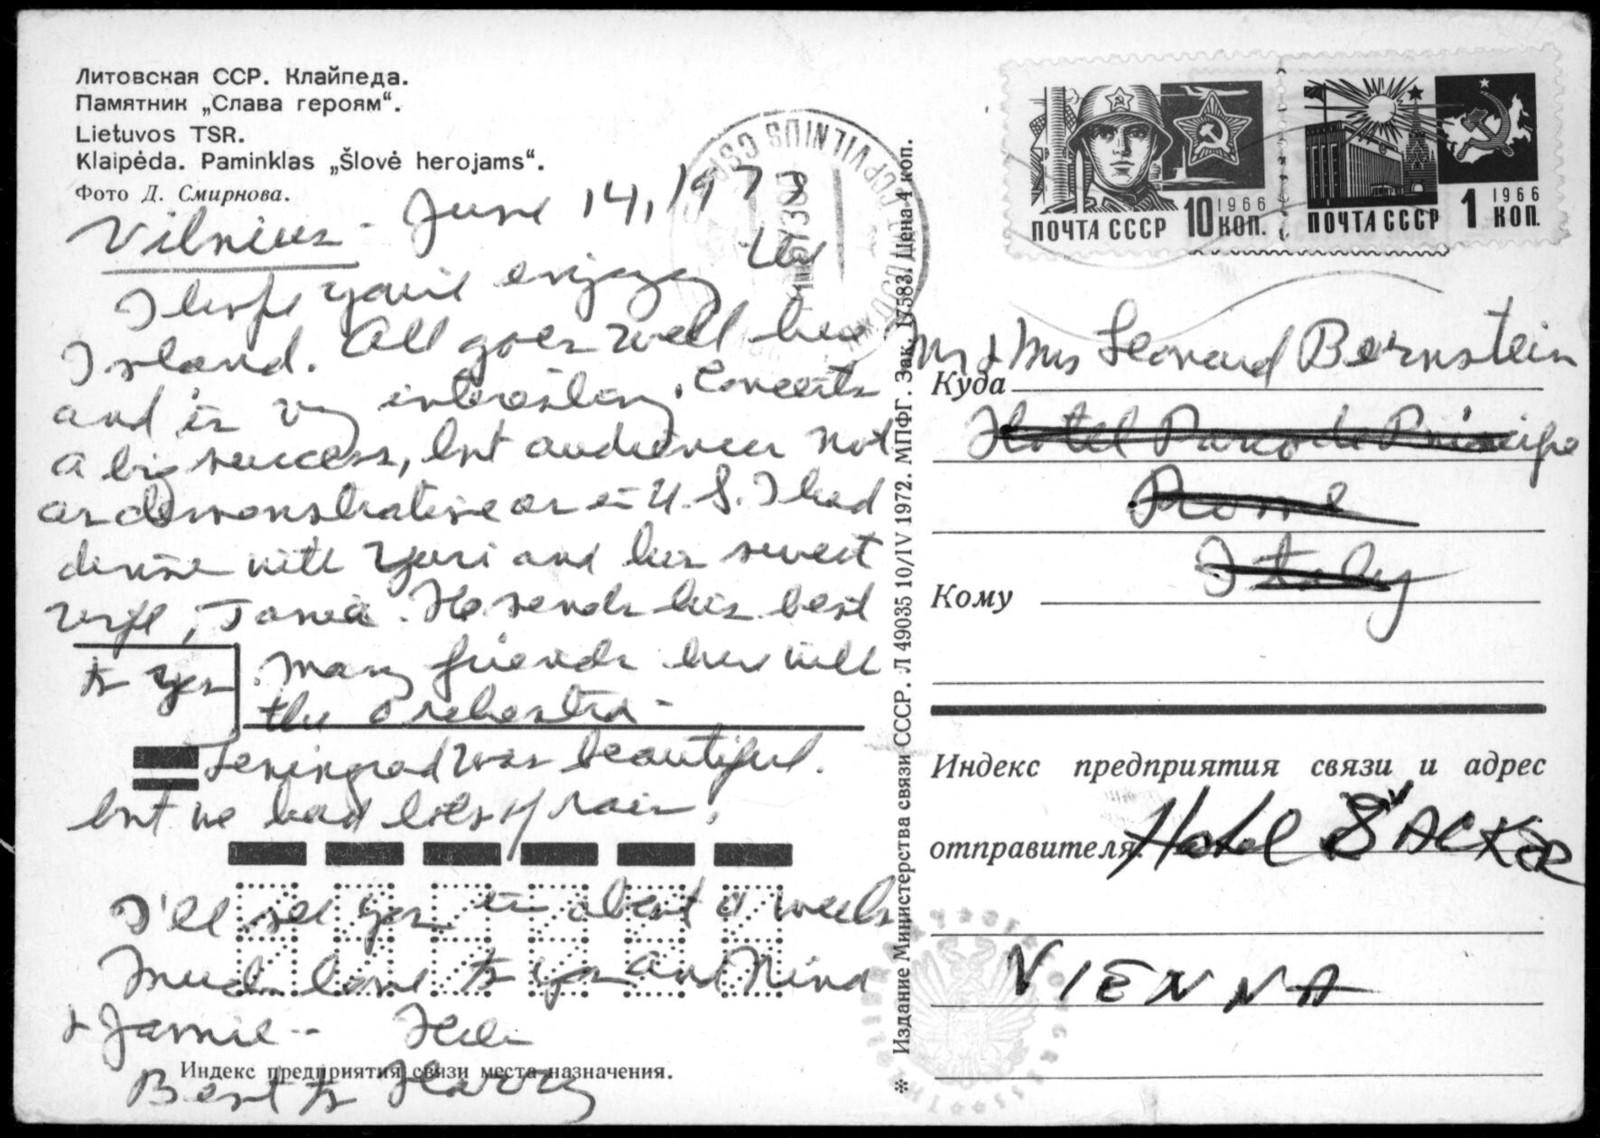 Letter from Helen Coates to Leonard & Felicia Bernstein, June 13, 1973